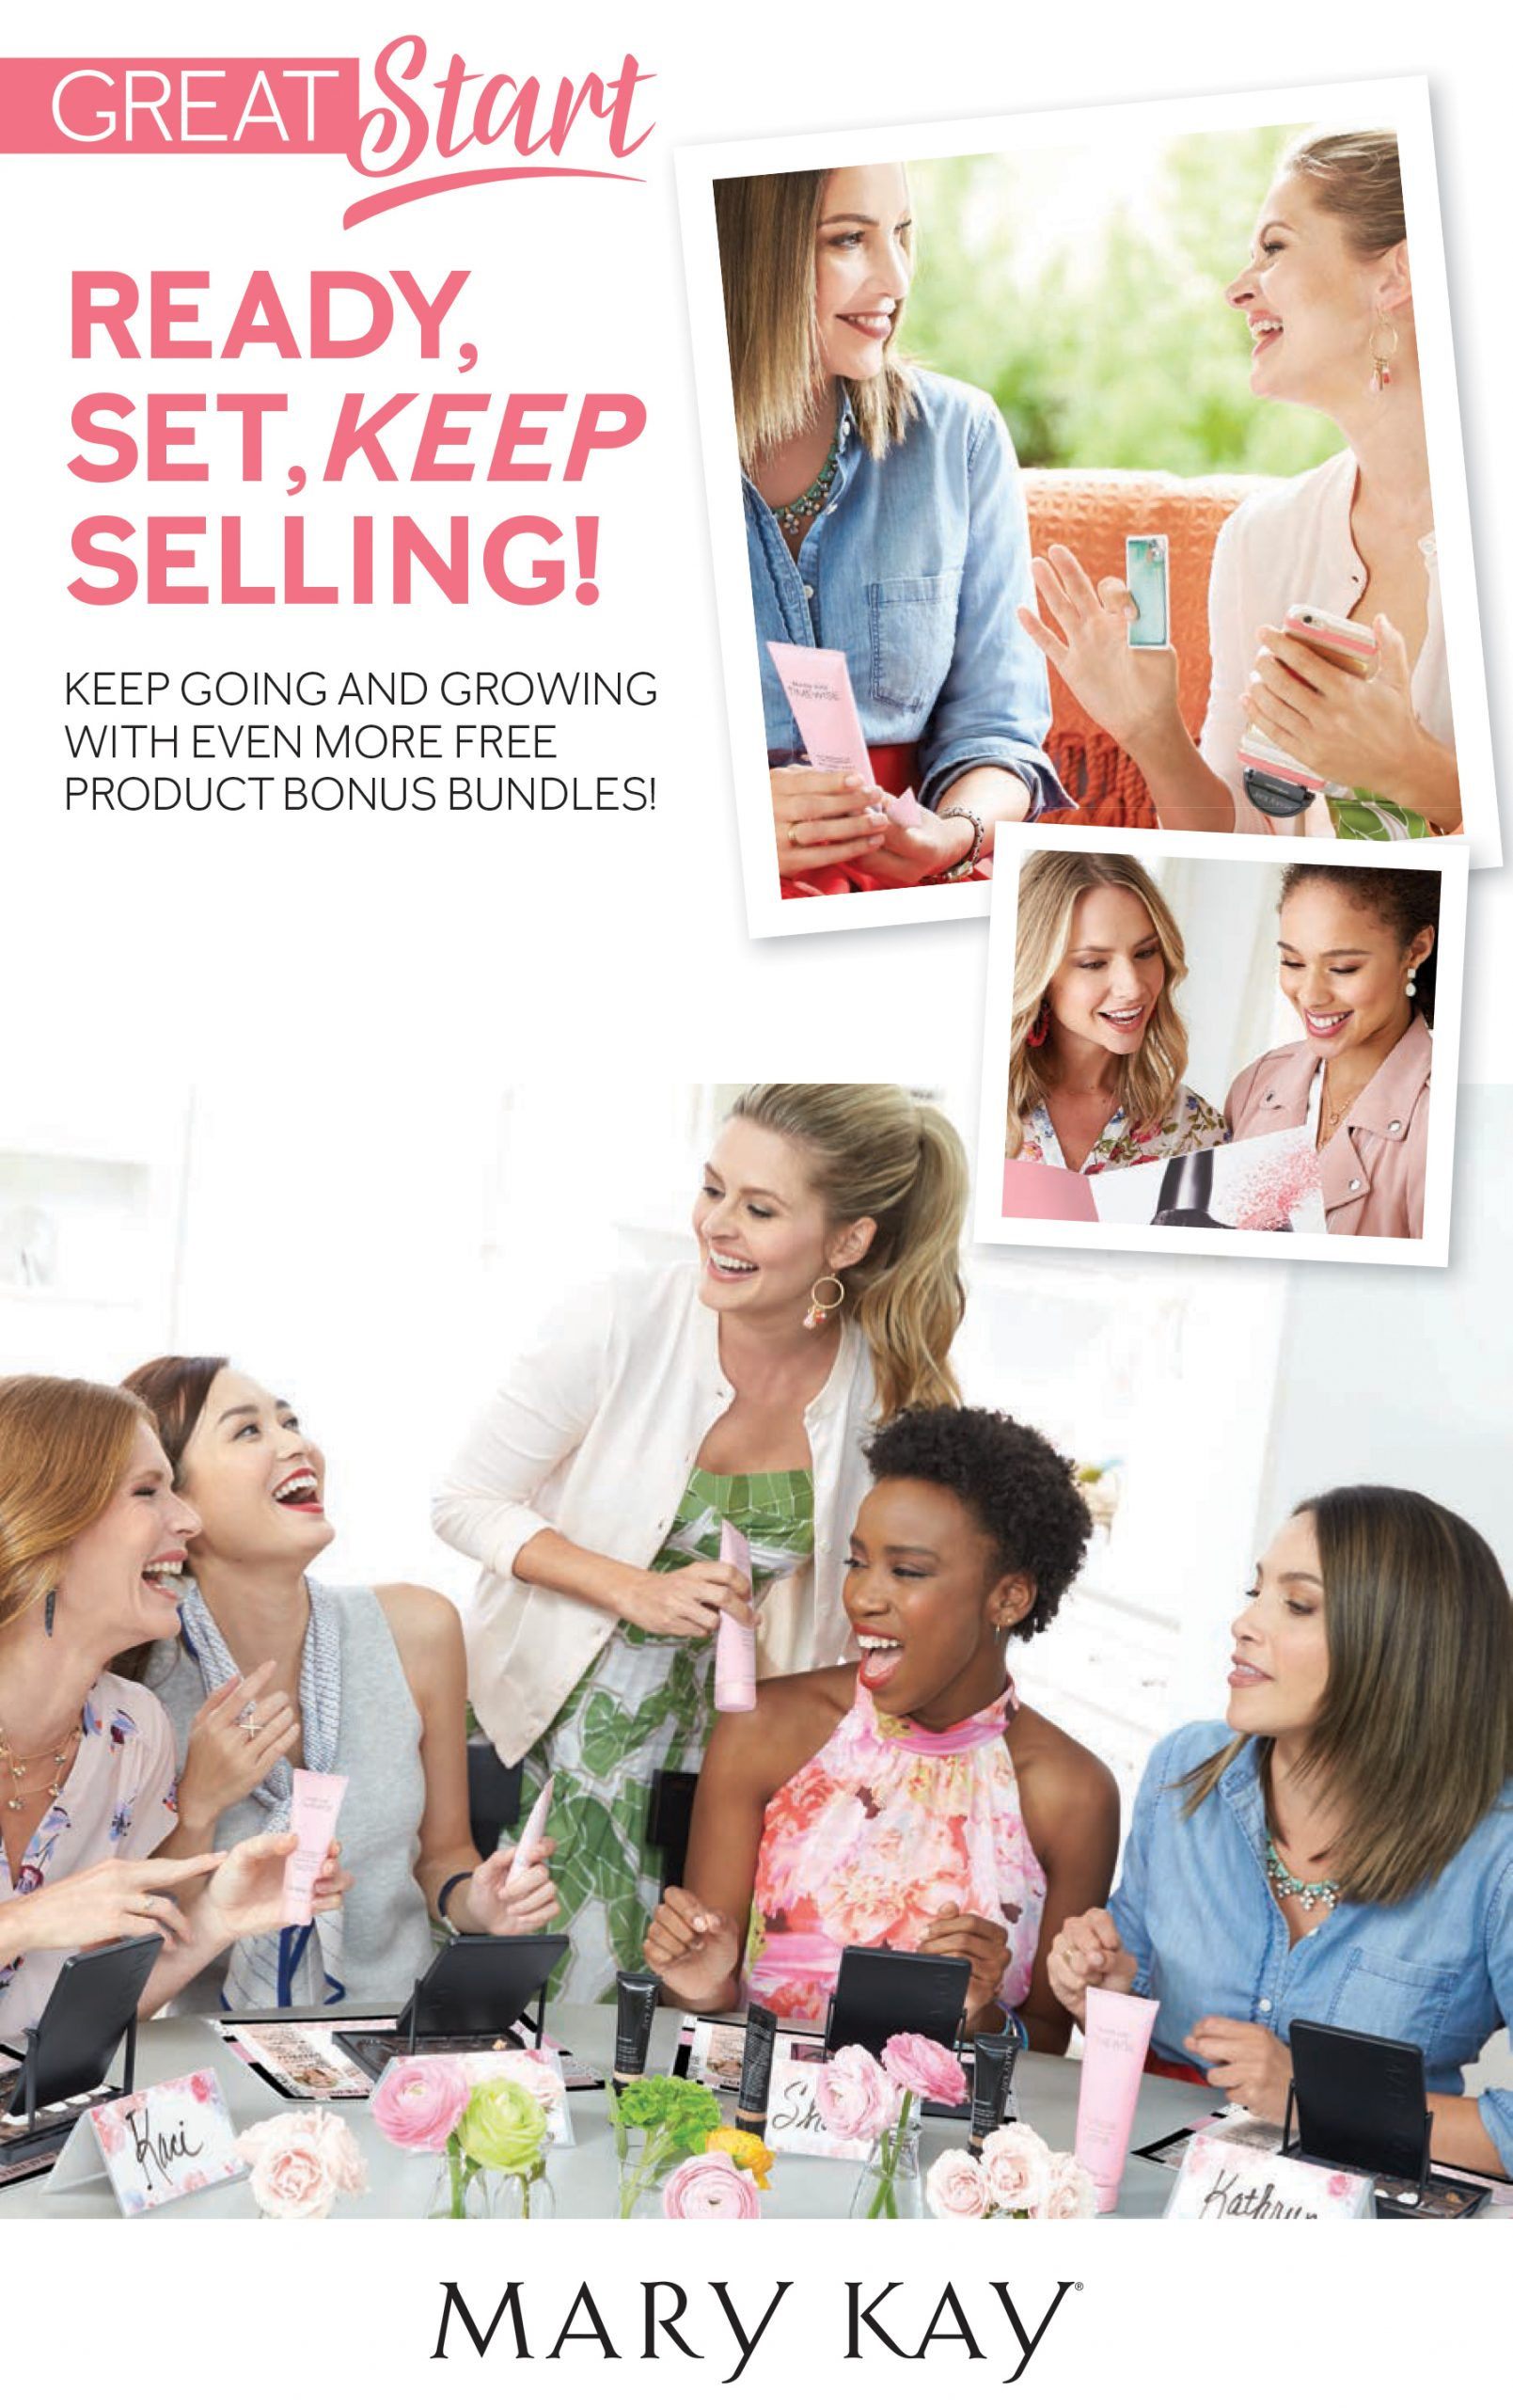 789909-PE-Great-Start-Ready-Set Keep-Selling-Brochure-ENG-1